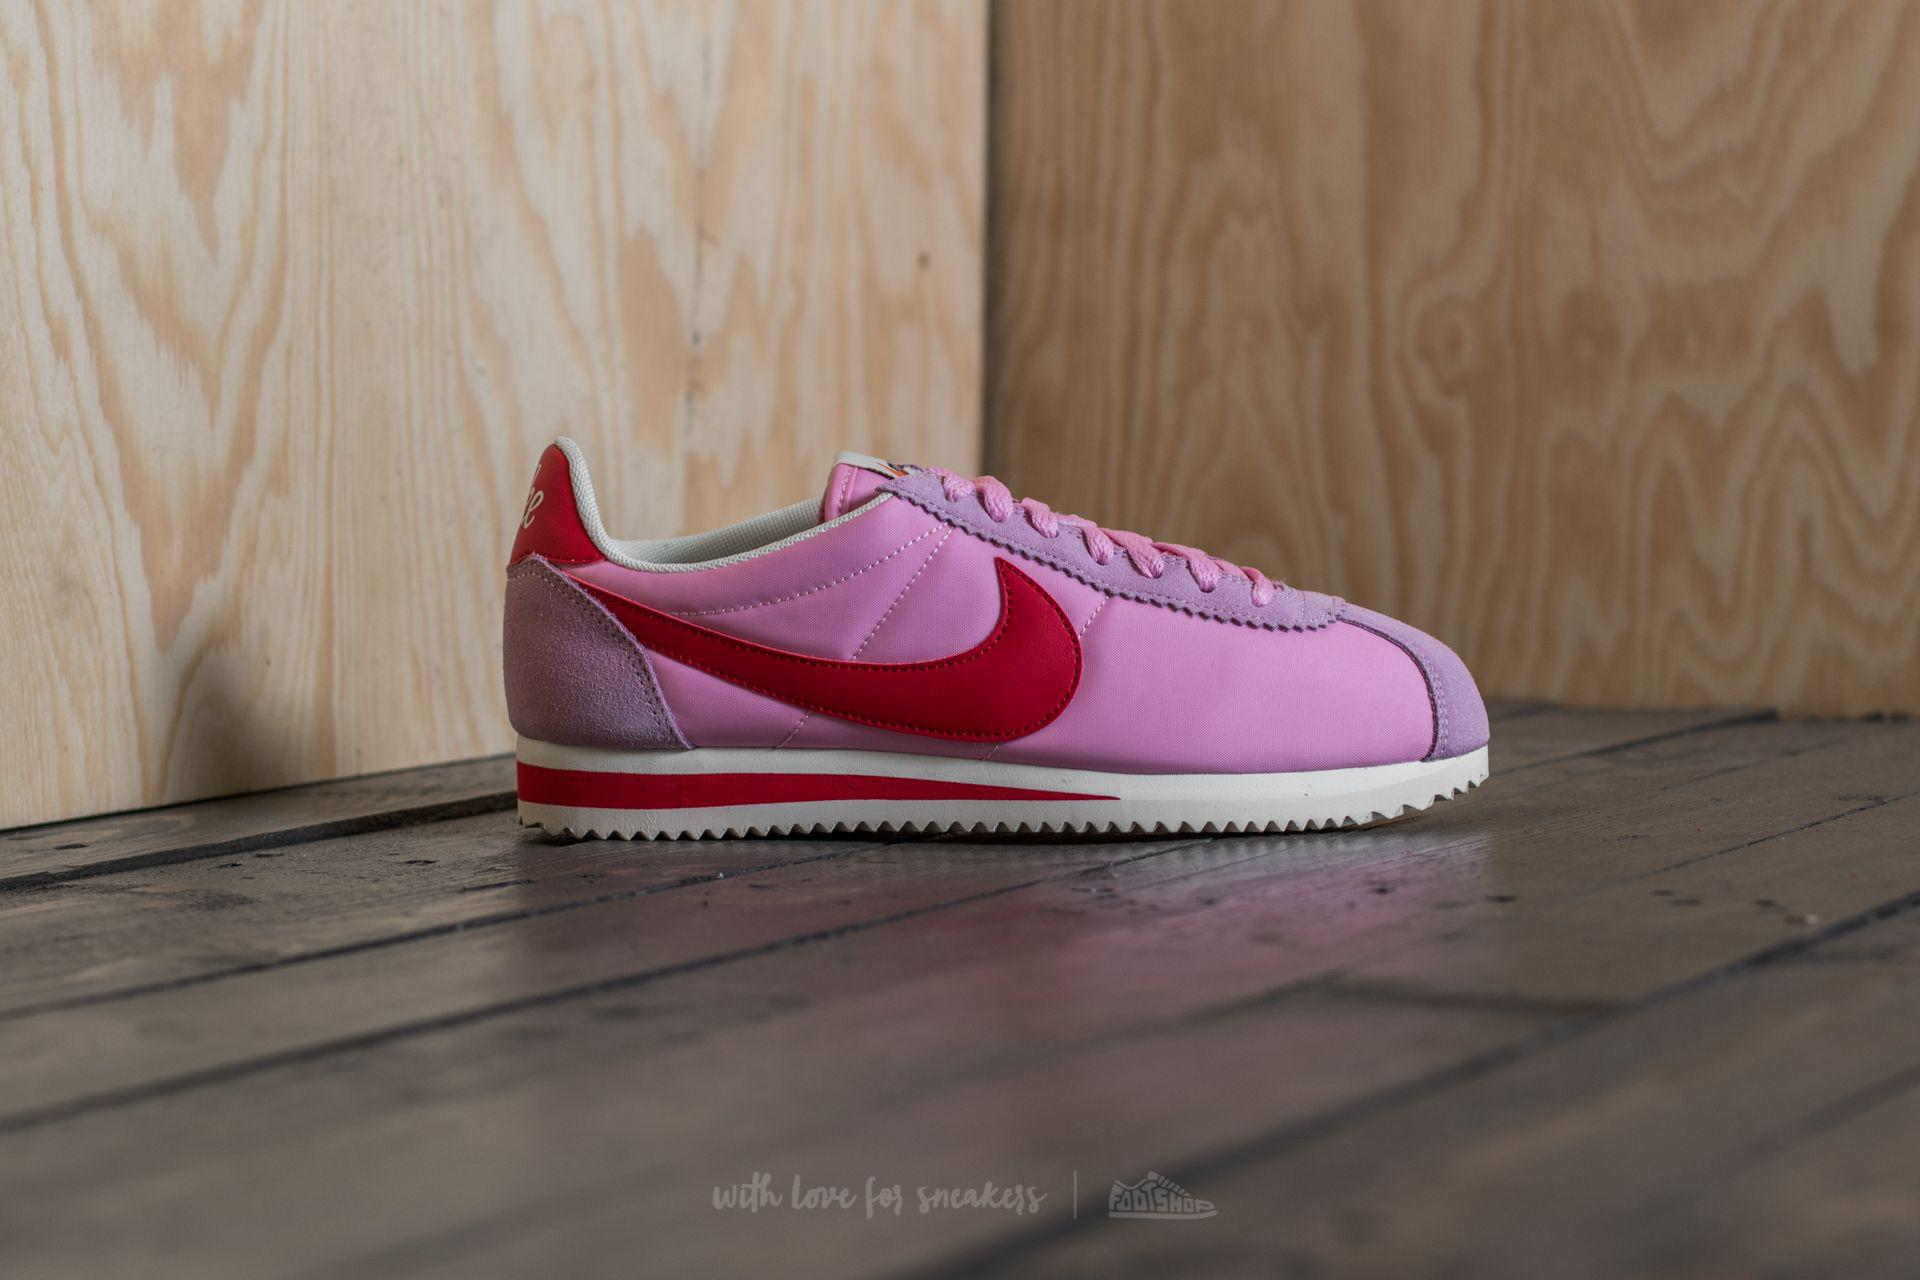 ad6147ef63444 spain nike cortez rose pink 988b5 052ce; uk lyst nike wmns classic cortez  nylon premium perfect pink sport 8c4bd 0f66d